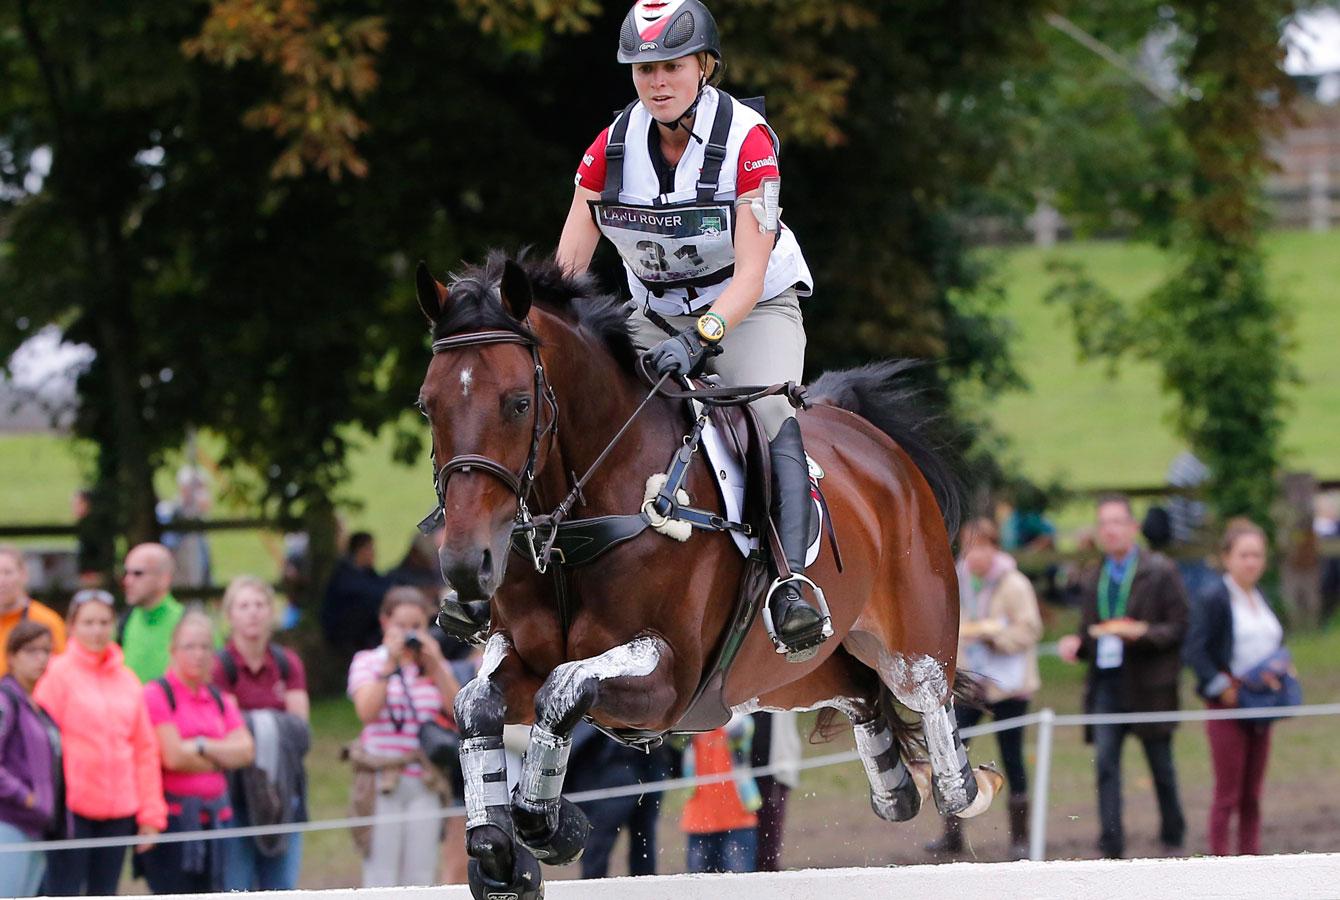 Jessica Phoenix riding Pavarotti at 2014 World Equestrian Games in France.